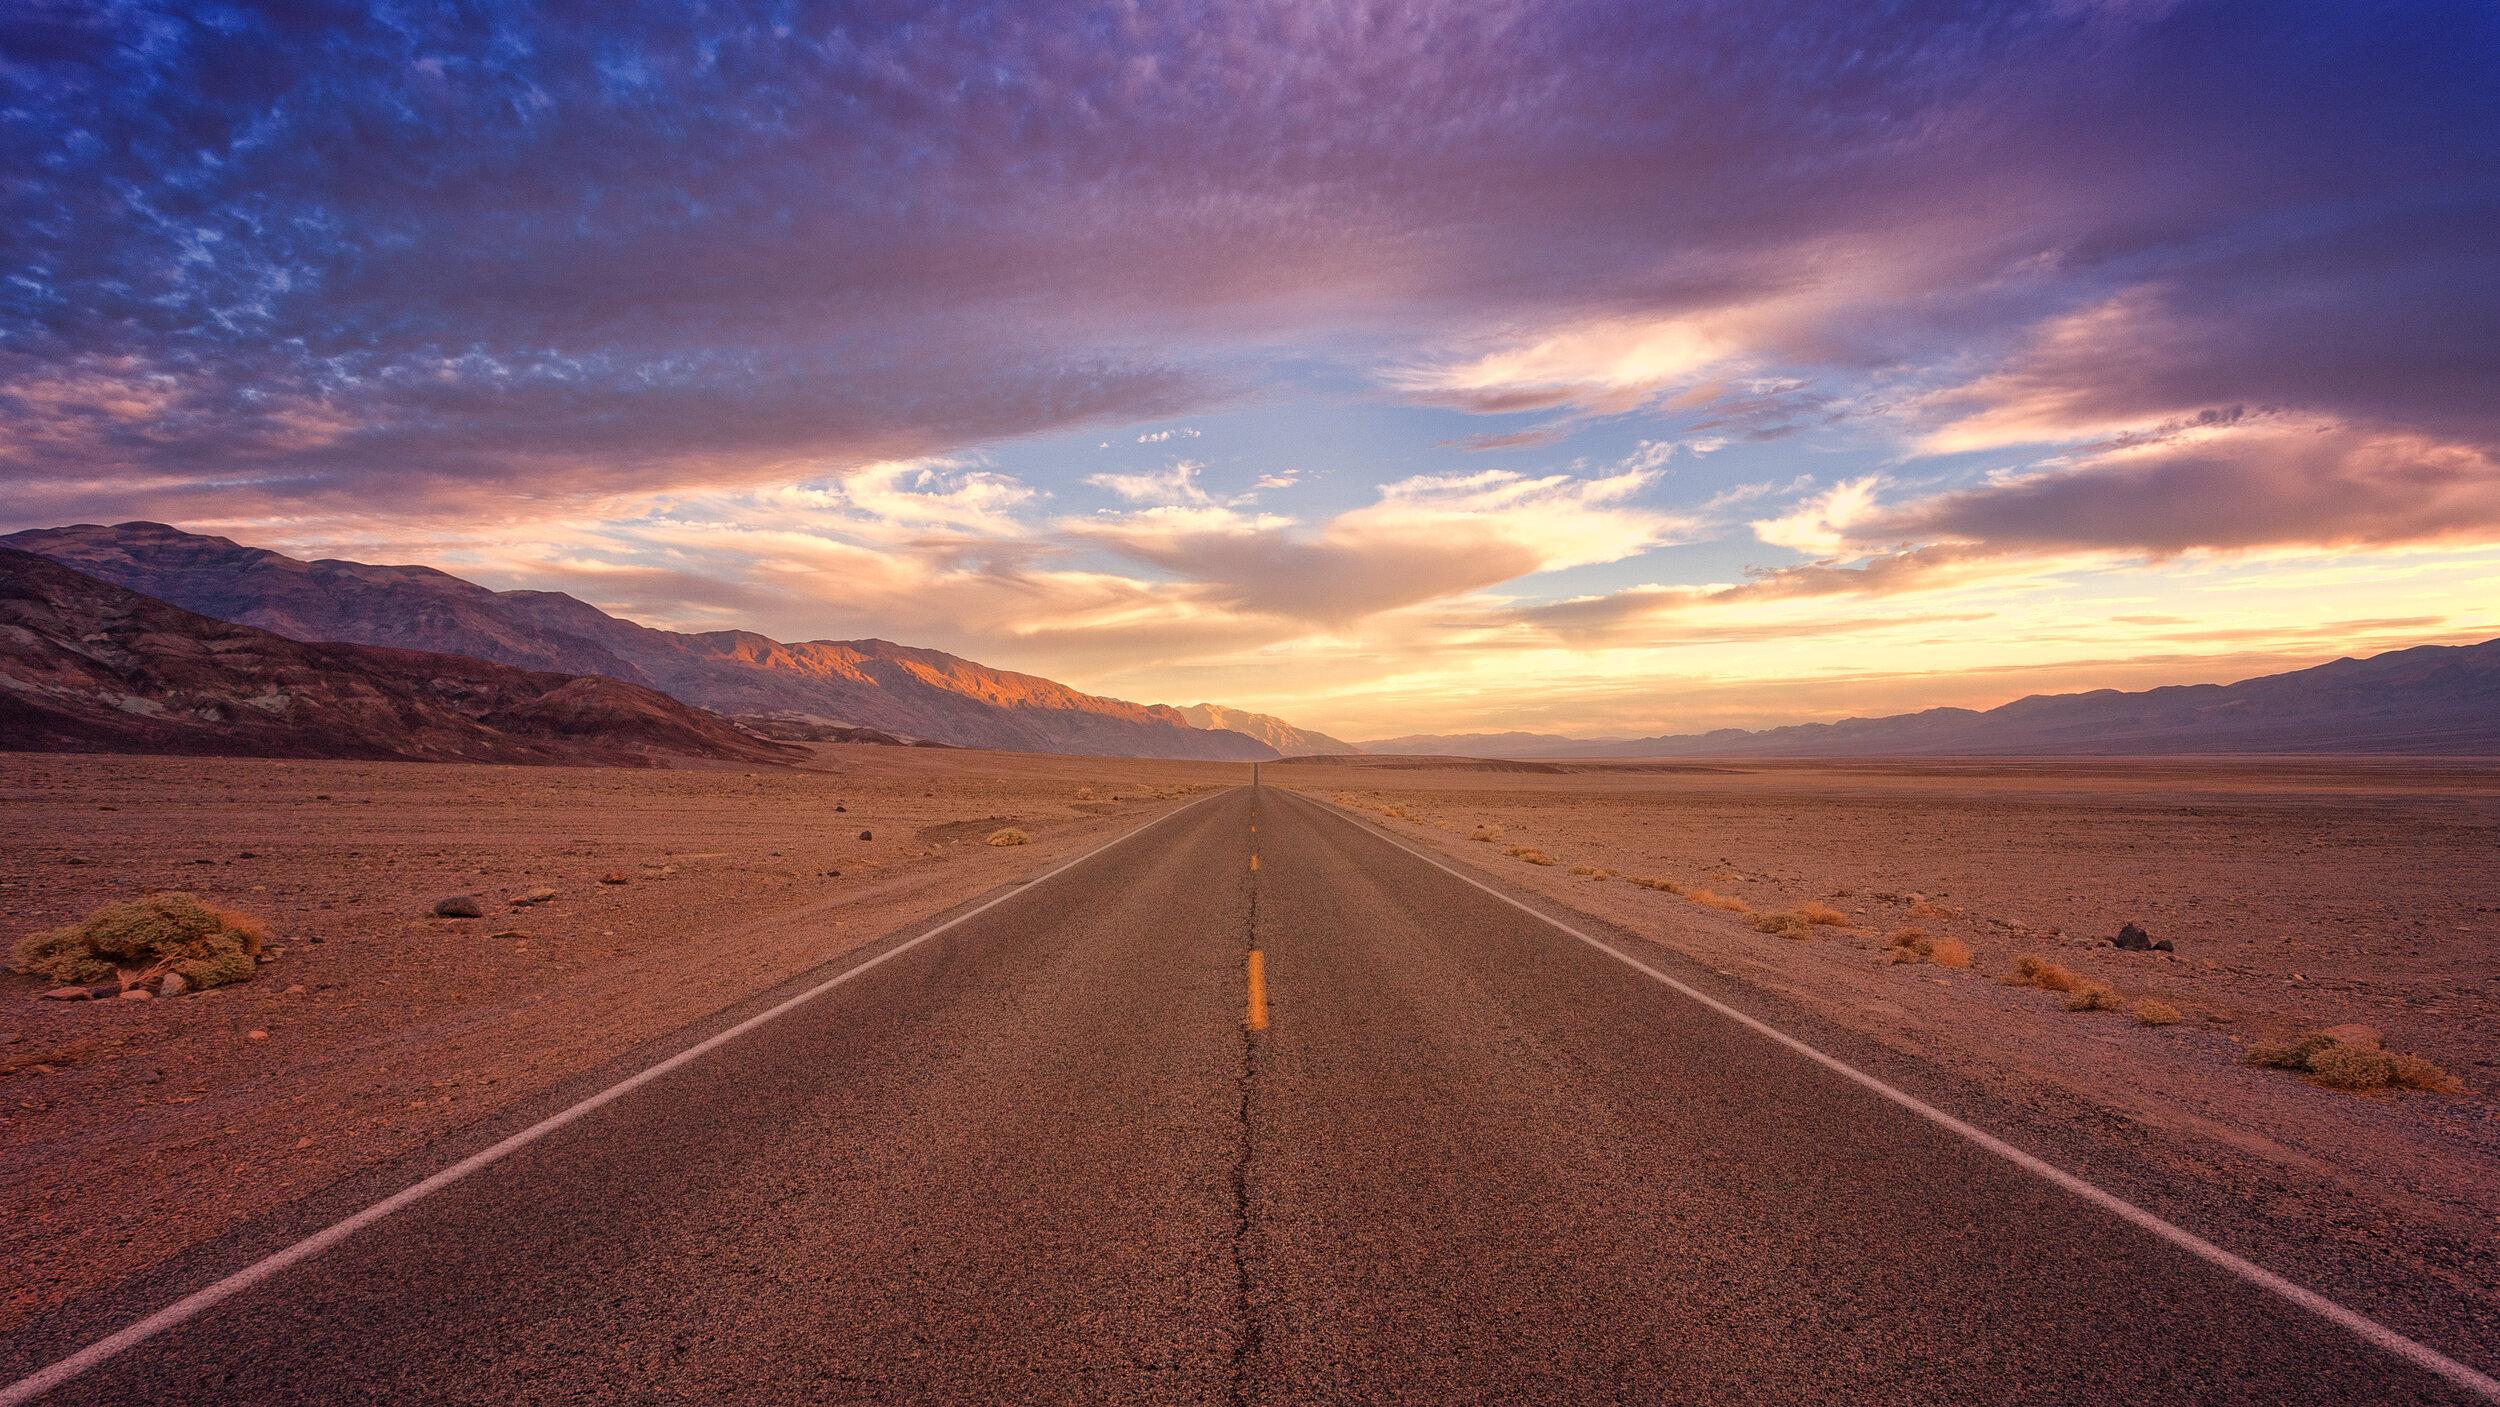 beautiful sunset over a desert road